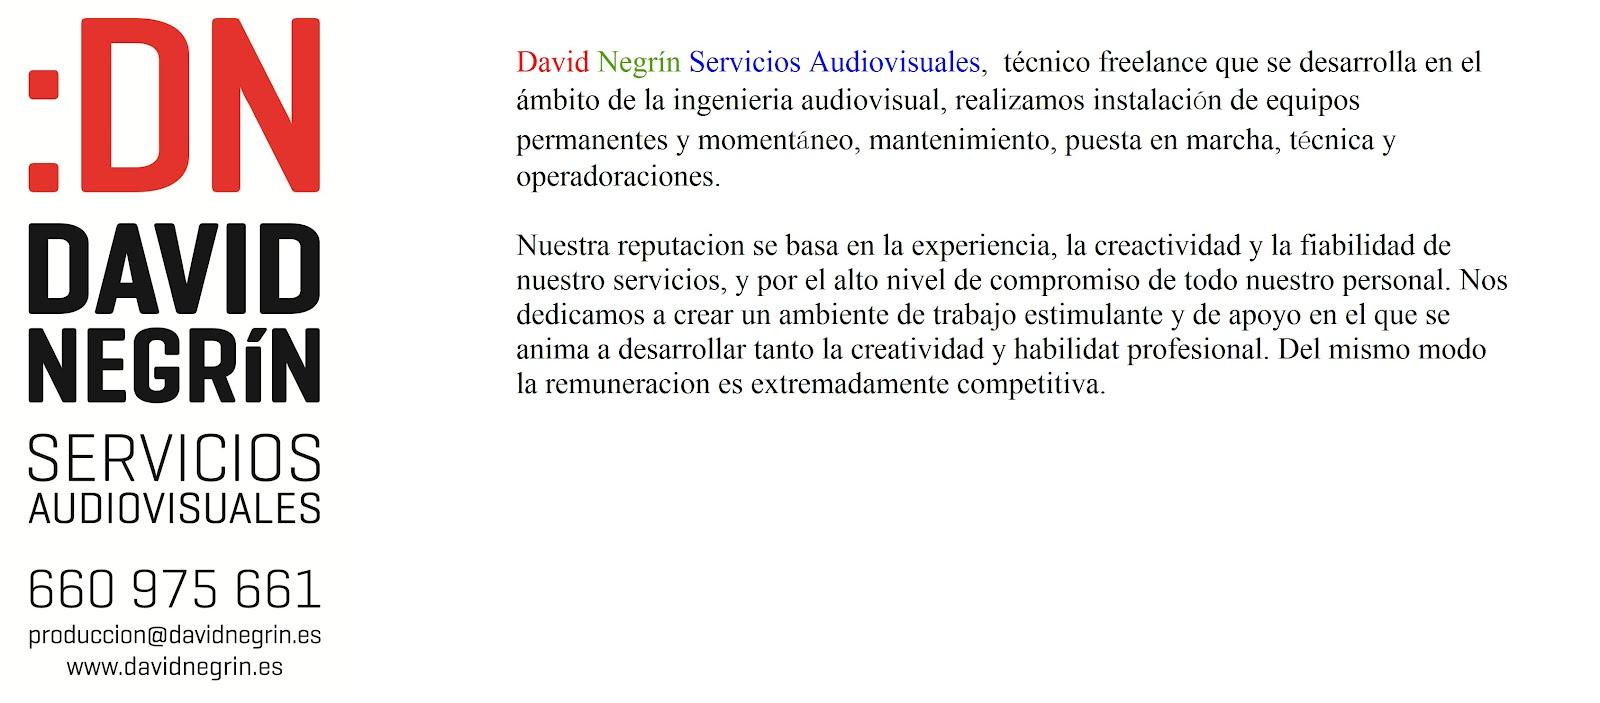 DAVID NEGRIN SERVICIOS AUDIOVISUALES